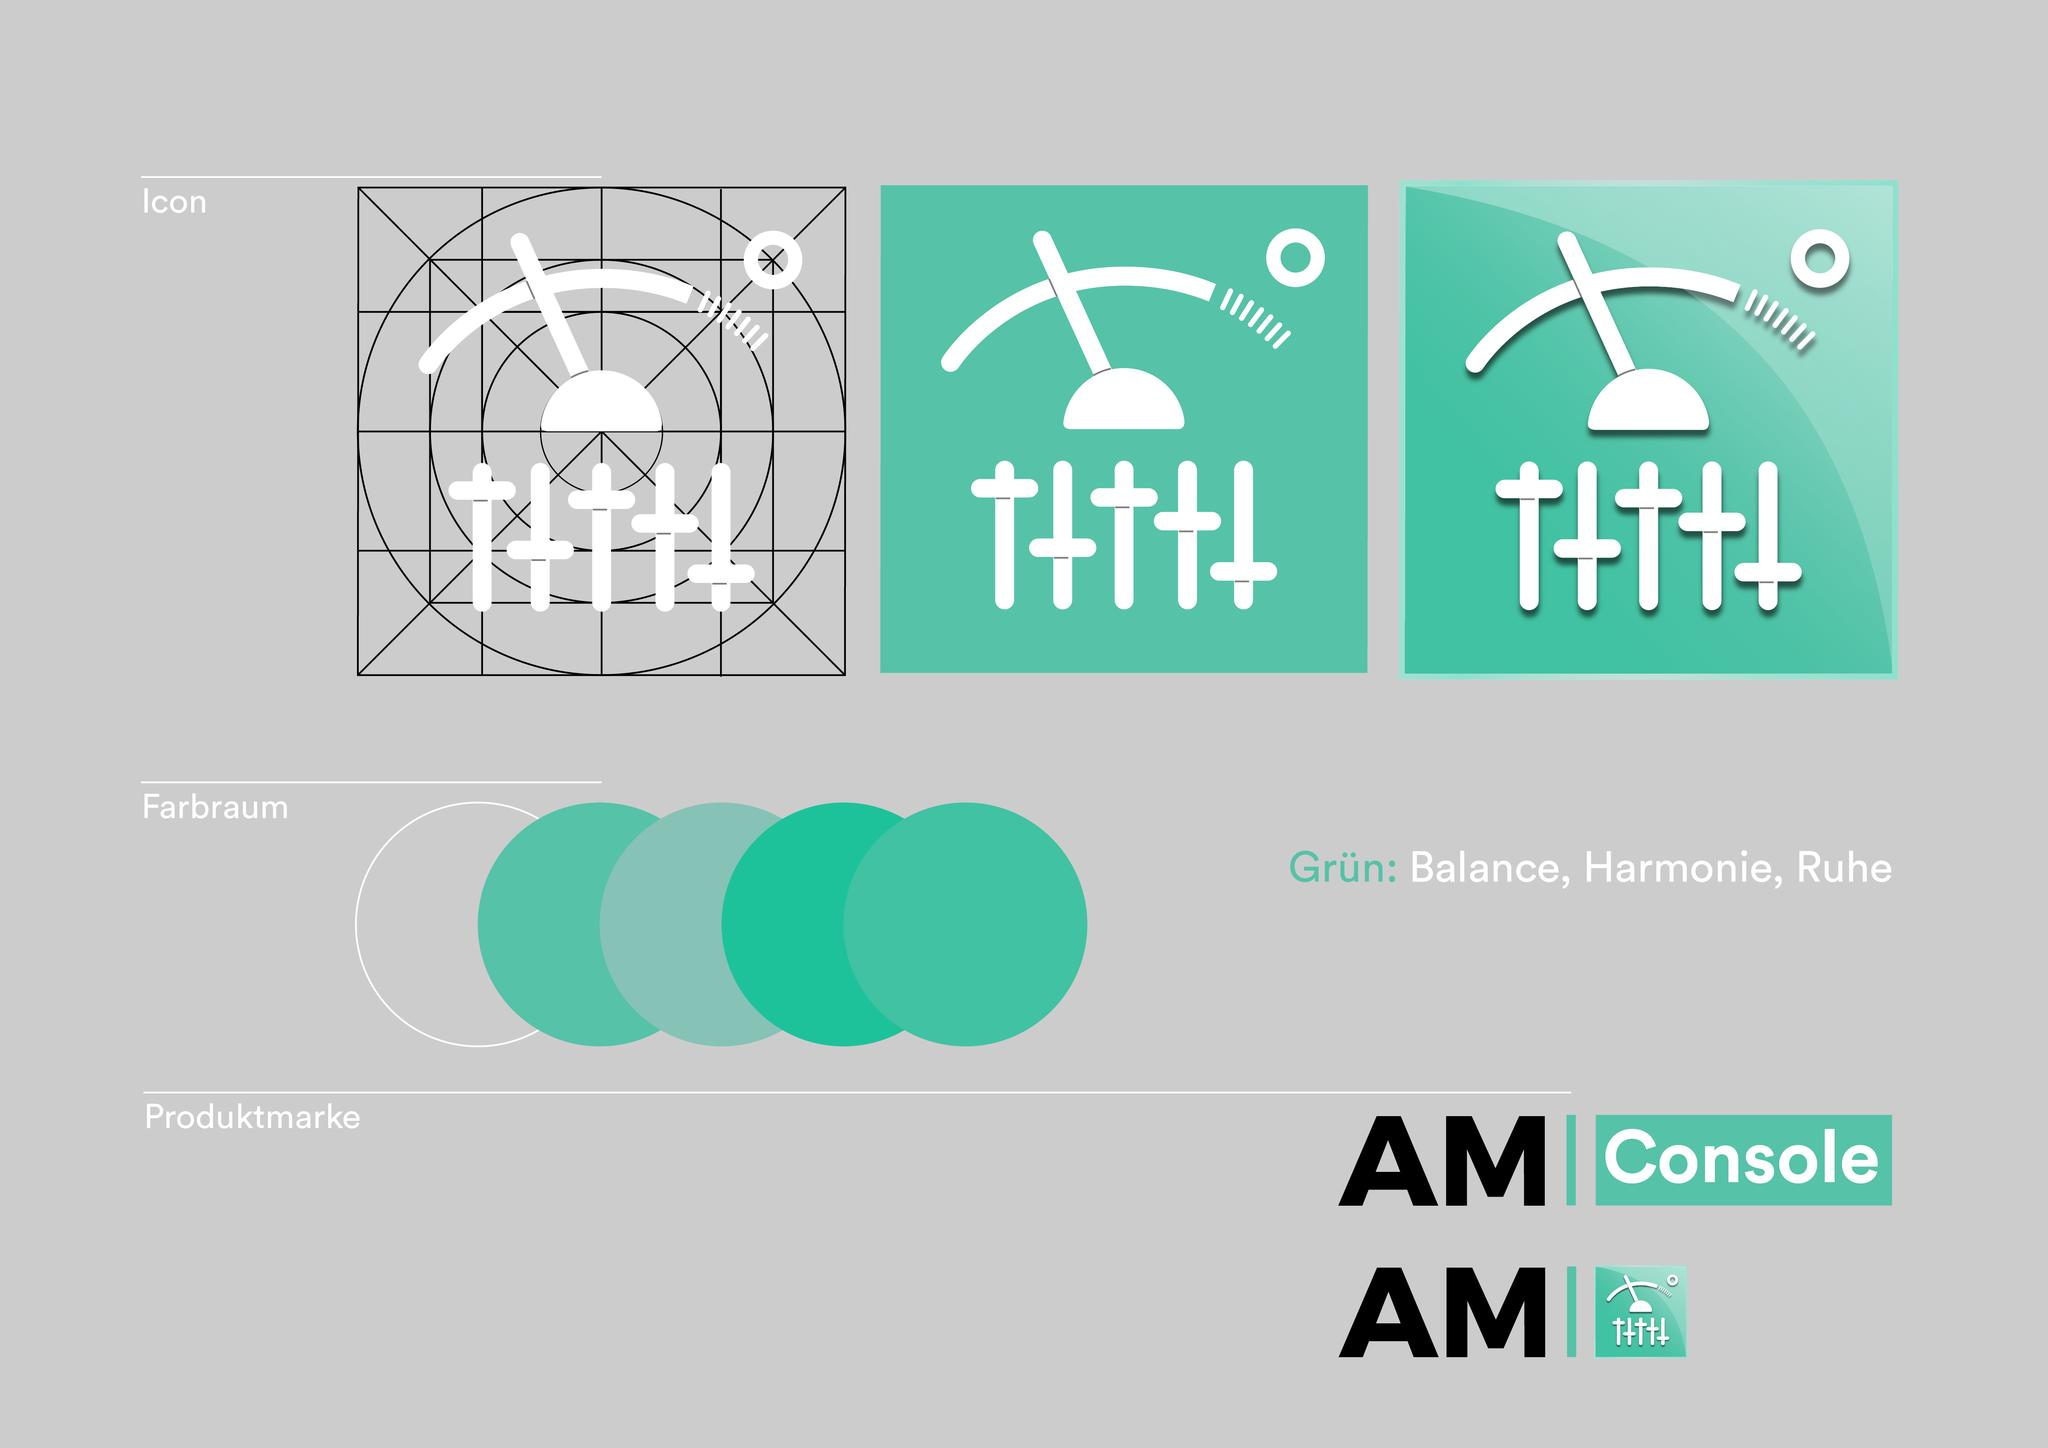 Produkt AM Console